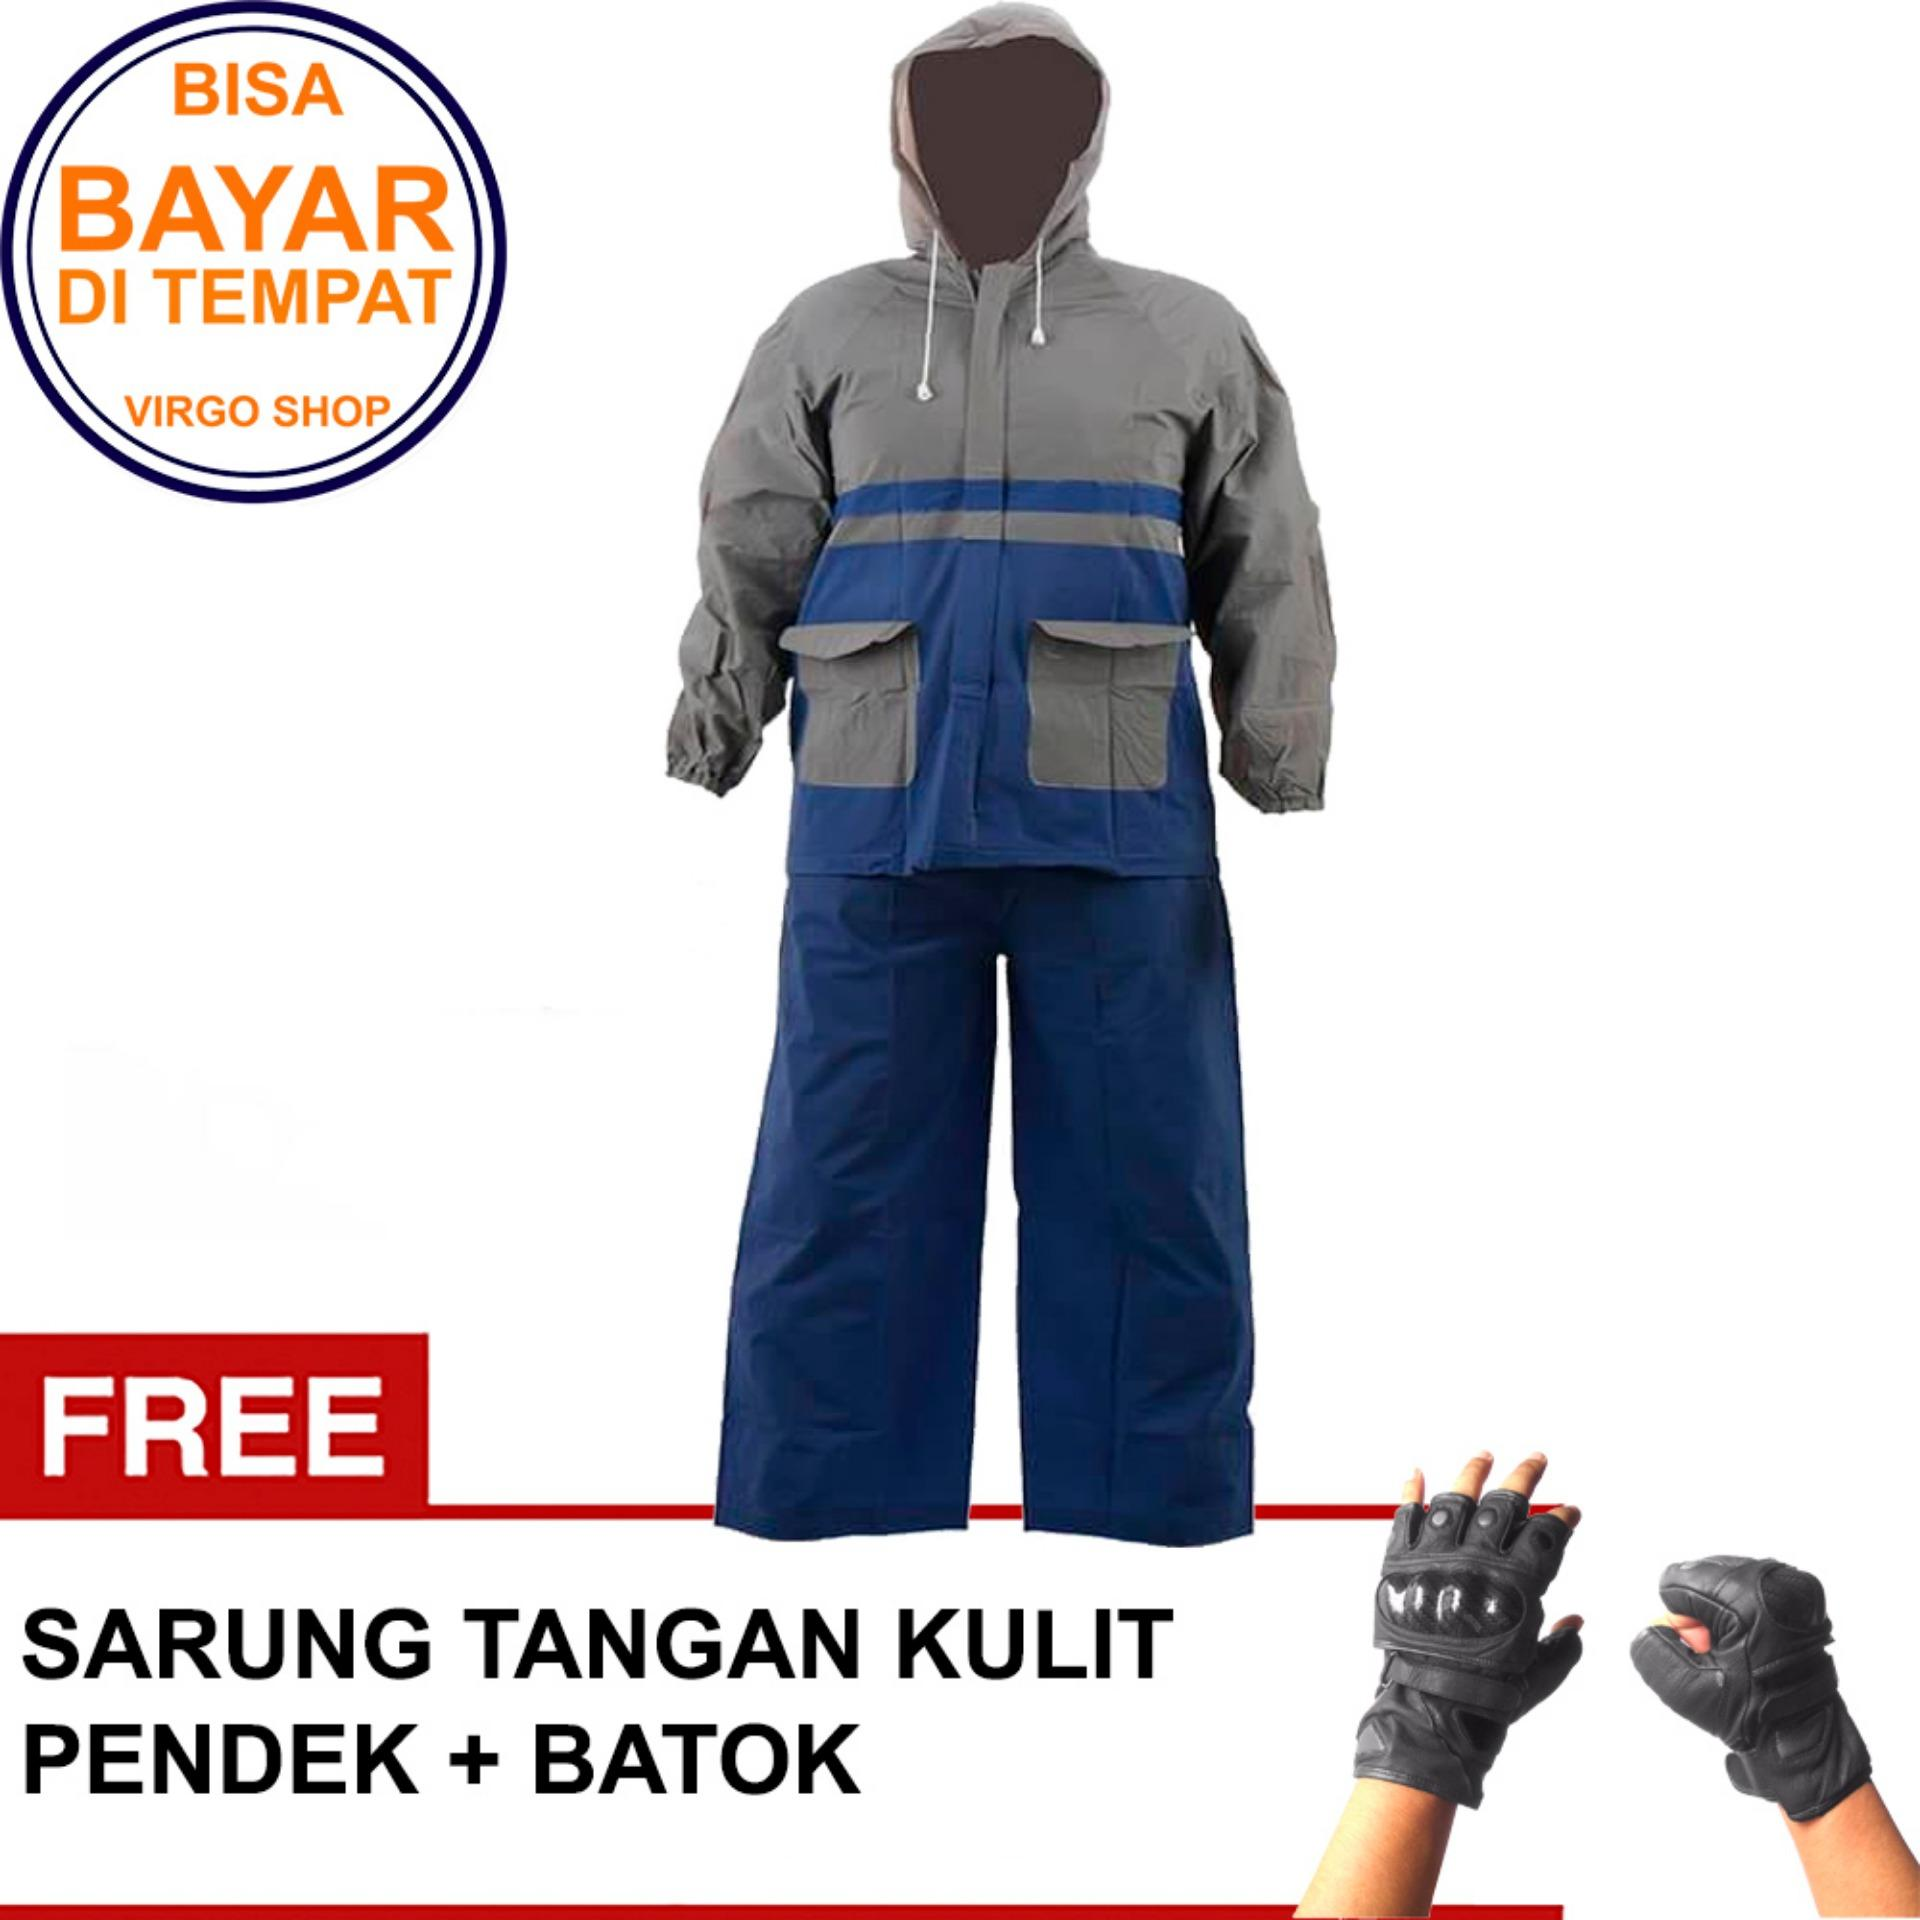 Elephant Jas Hujan Jaket Celana Abu abu - Biru Bonus Sarung tangan Kulit Batok